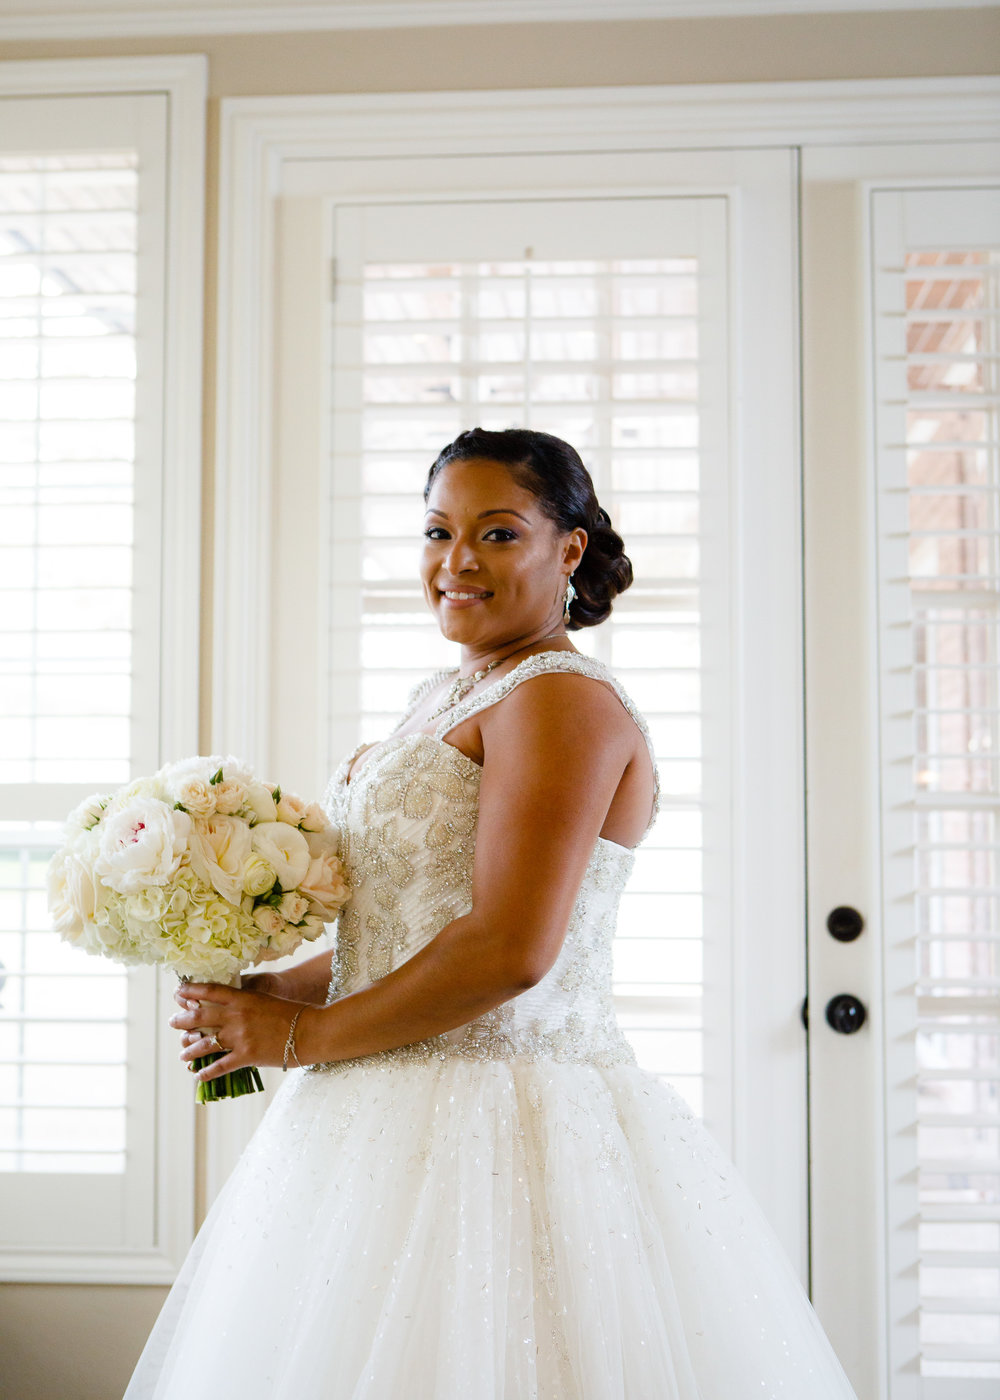 Dallas-wedding-planner-swank-soiree-fort-worth-weddingTLWed1217-221.jpg